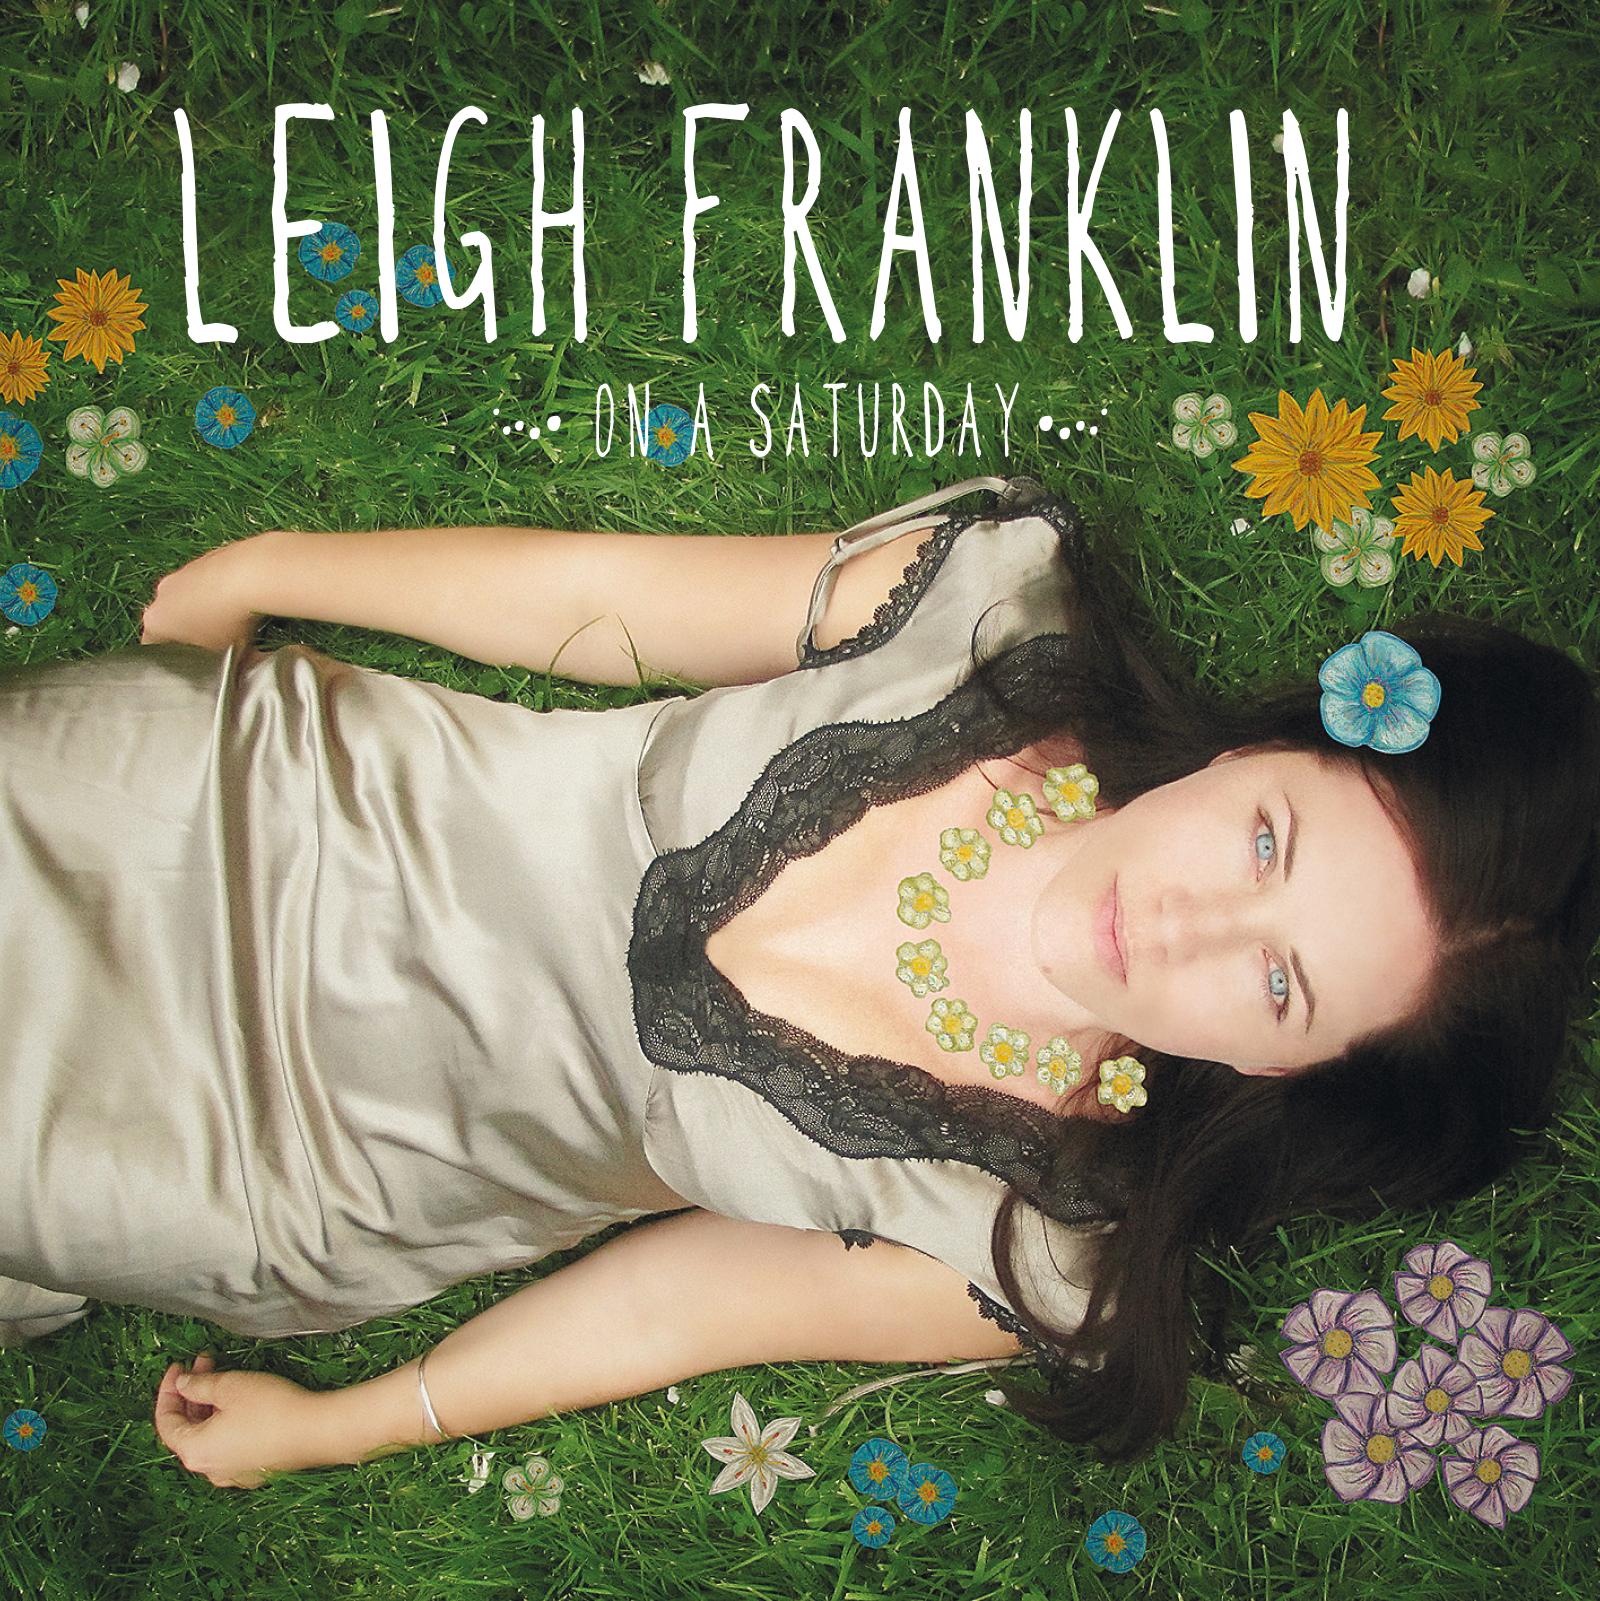 Leigh Franklin 'On A Saturday'